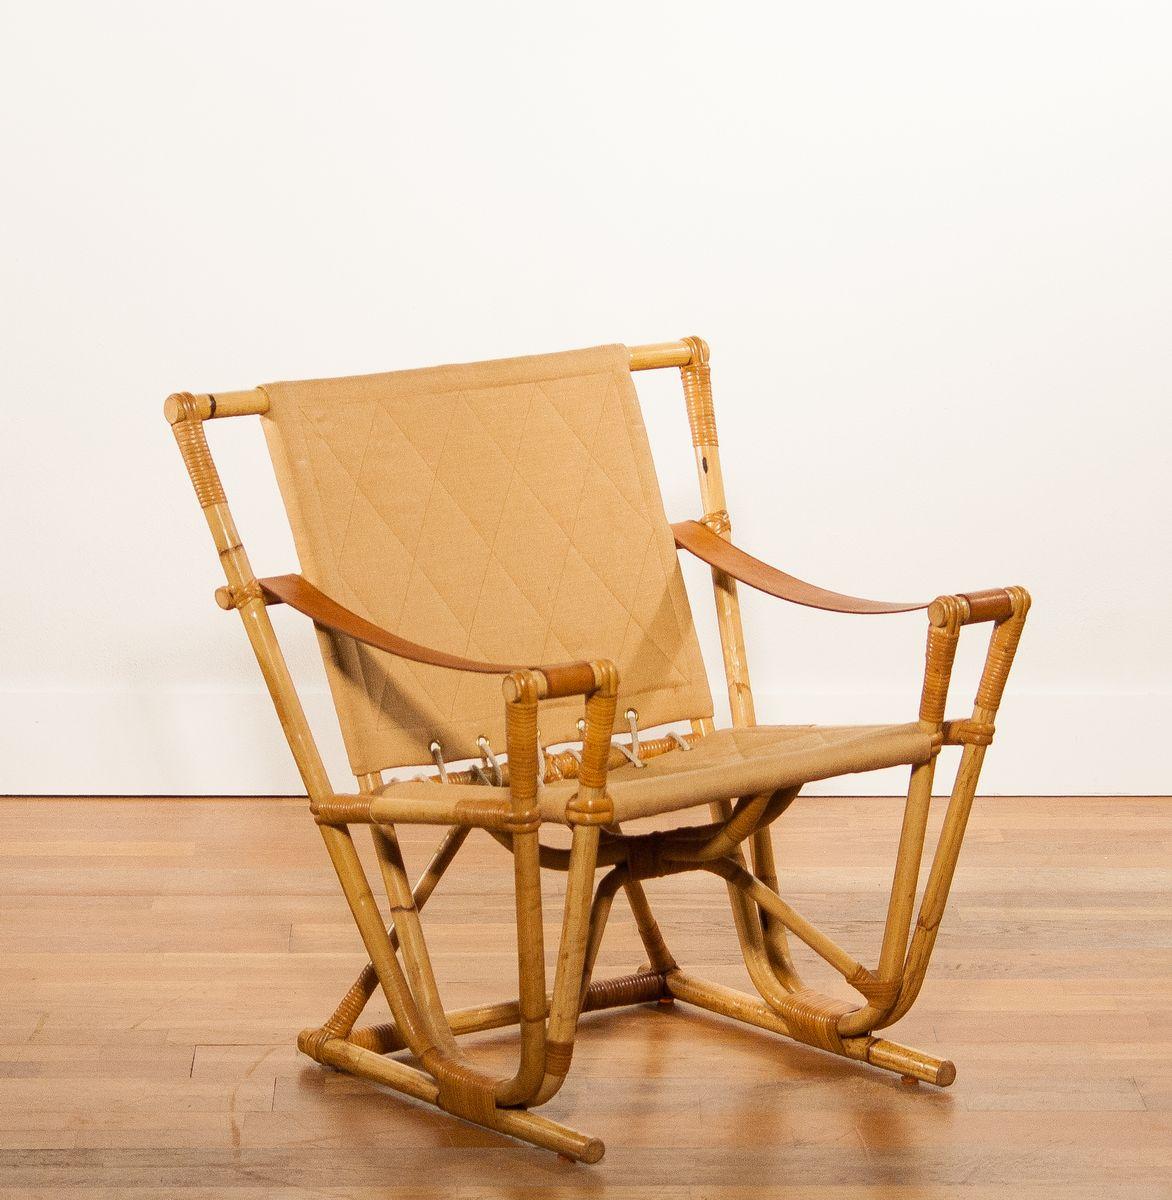 Bamboo rocking chair - Price Per Piece